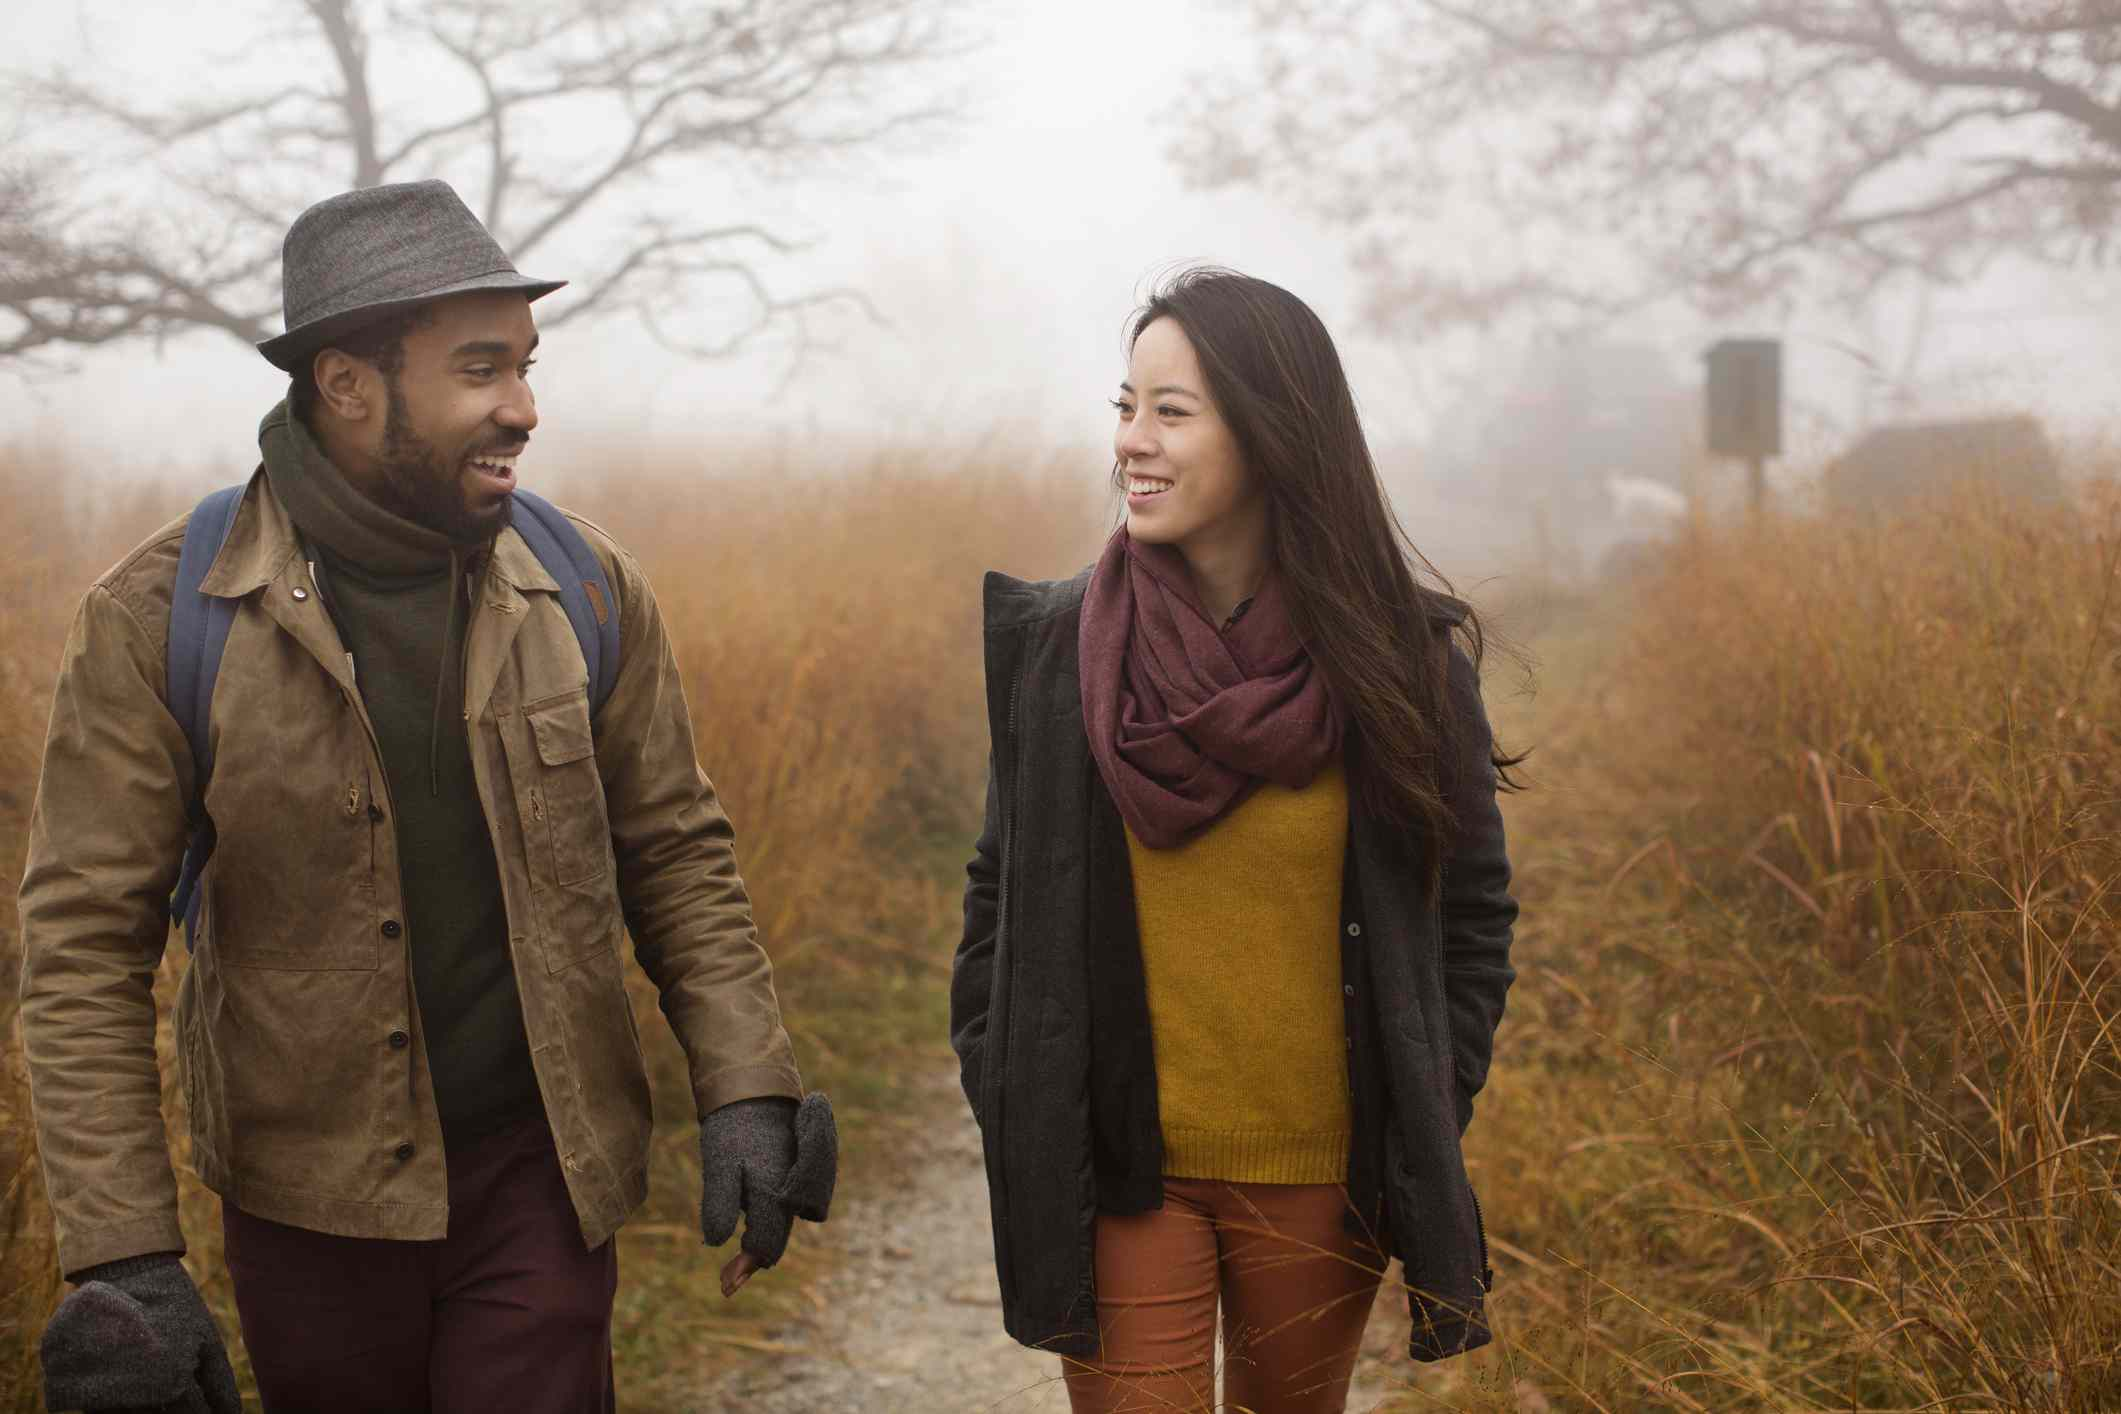 Couple hikes during fall season